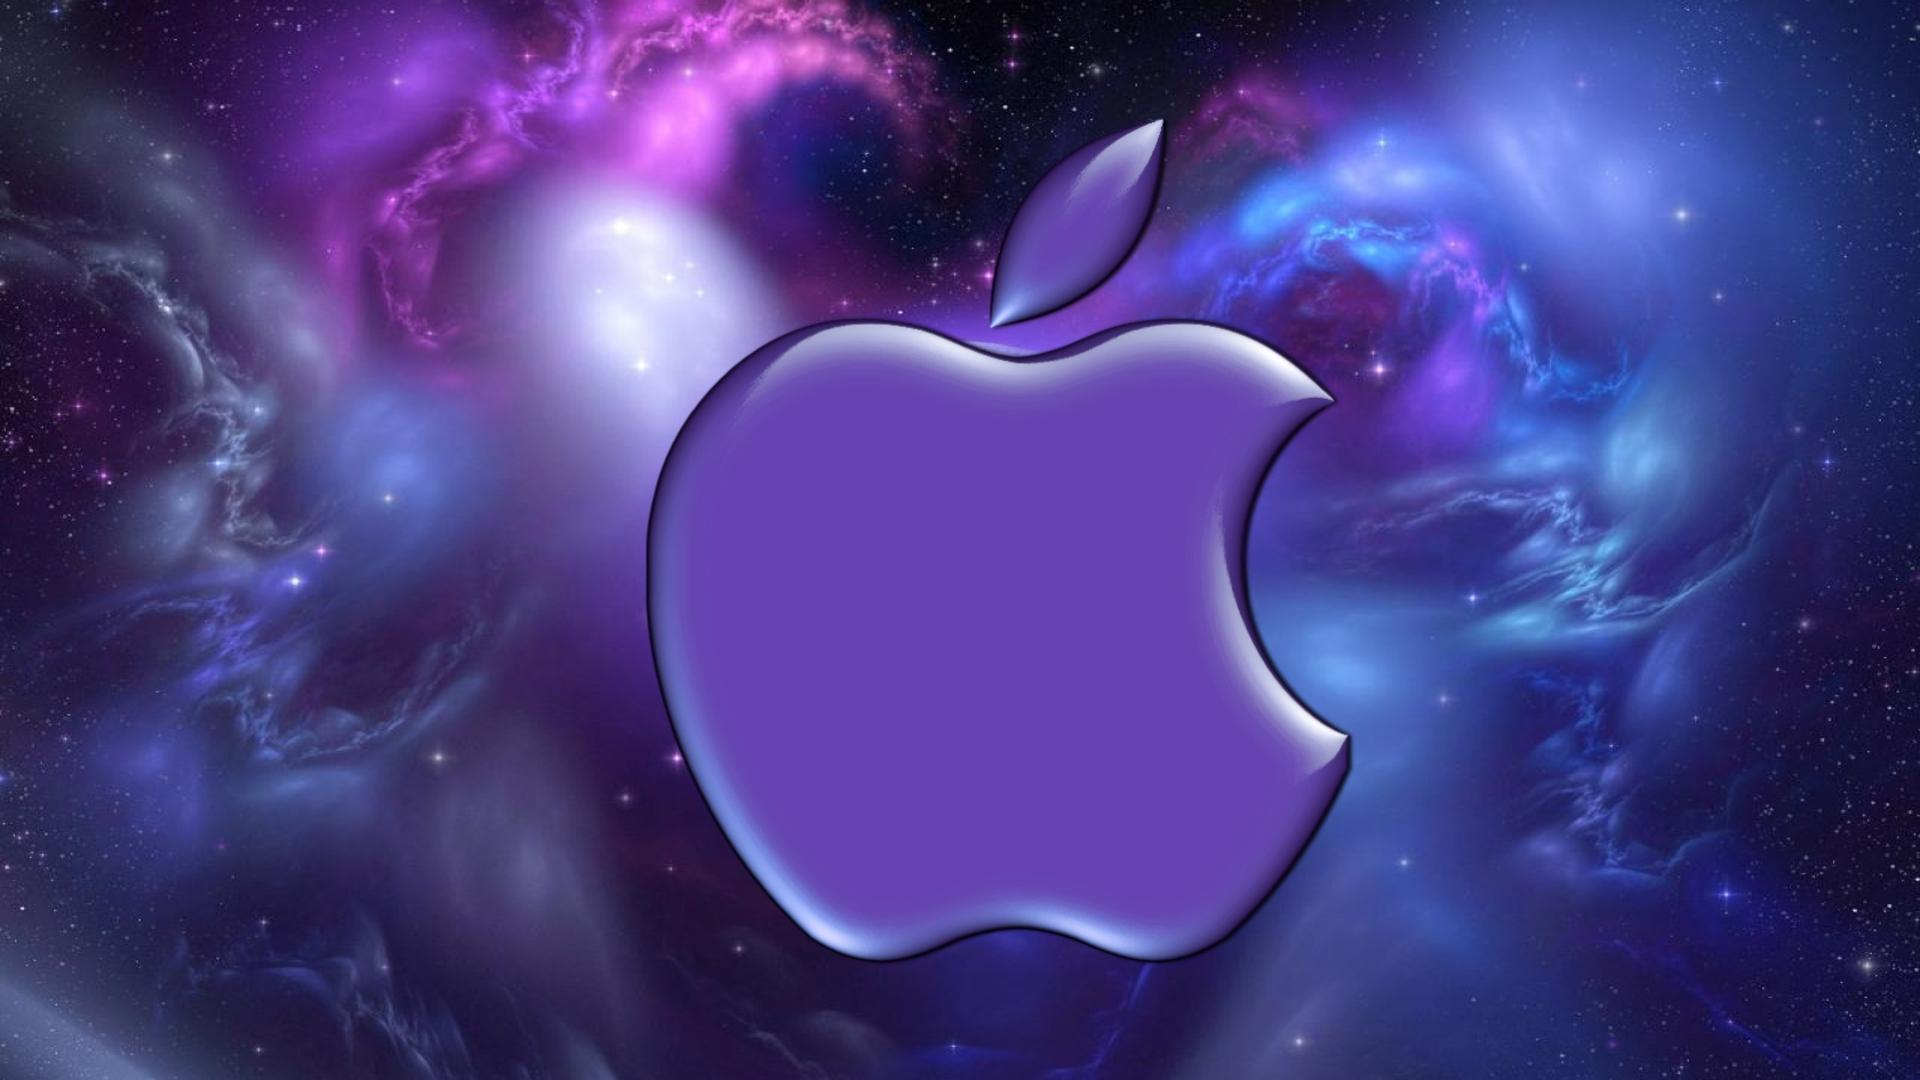 apple主题 第33辑桌面背景图片高清桌面壁纸下载  苹果7壁纸高清壁纸